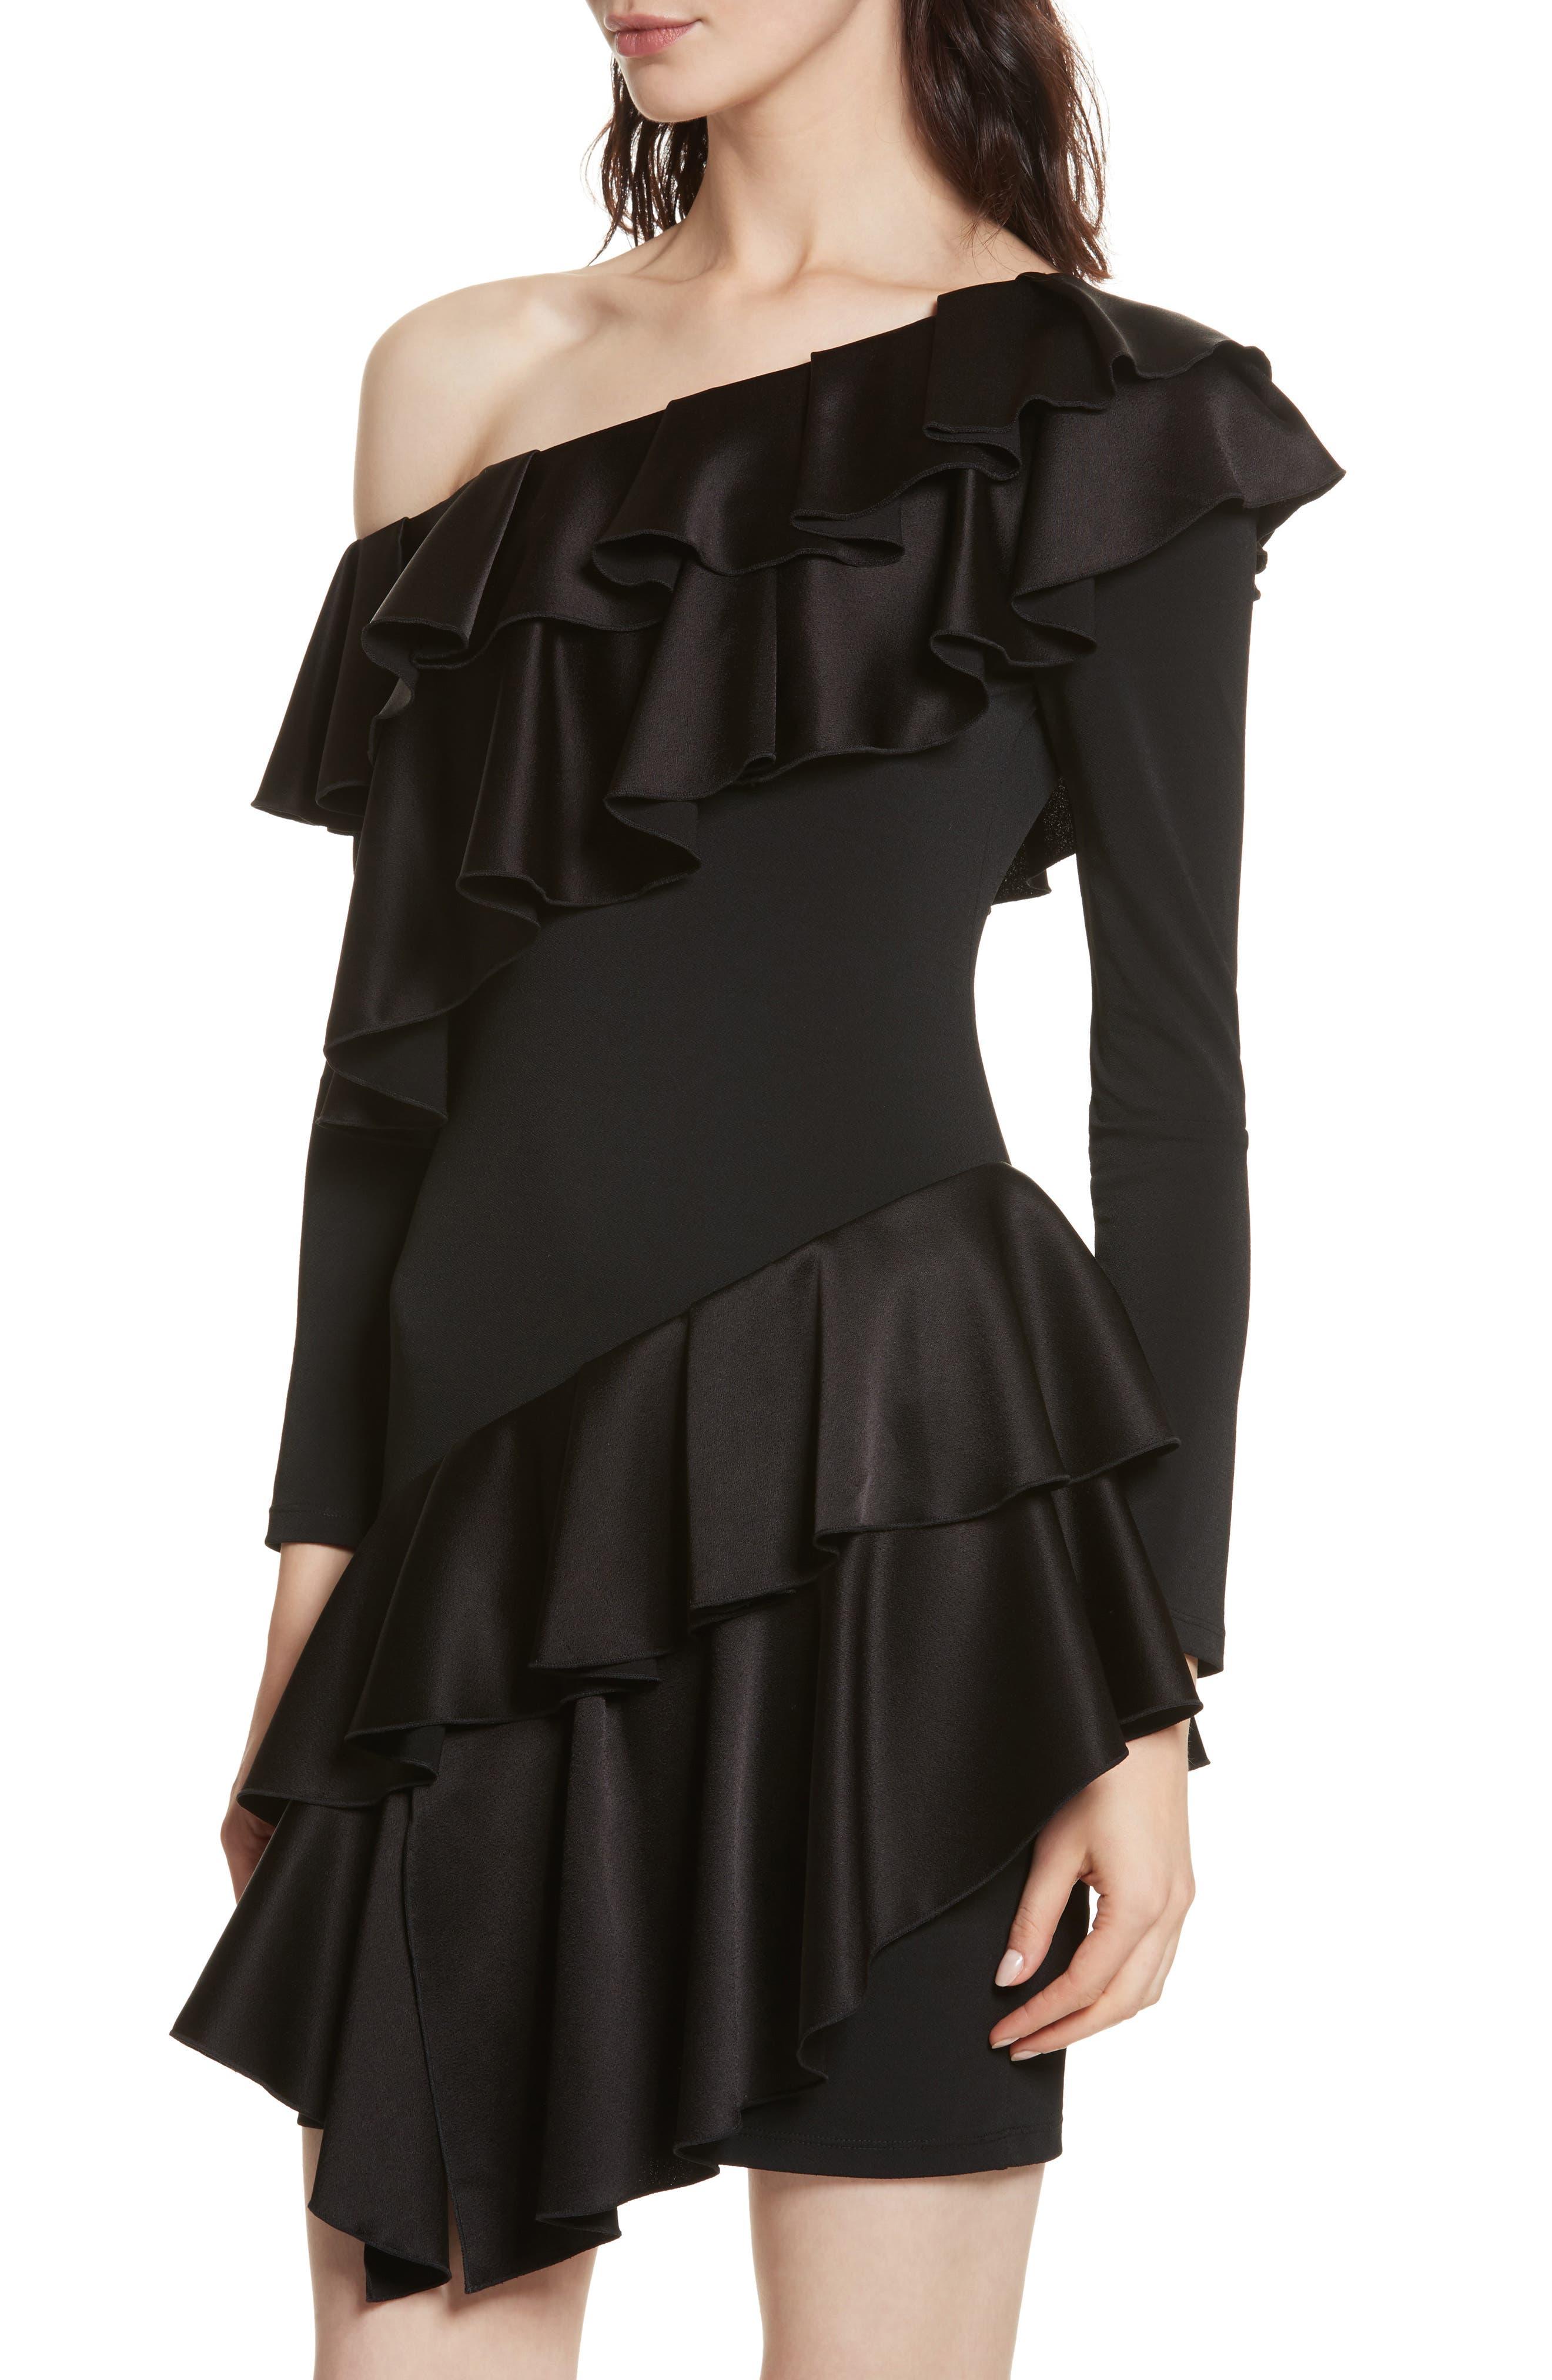 Izzy One-Shoulder Ruffle Dress,                             Alternate thumbnail 4, color,                             Black